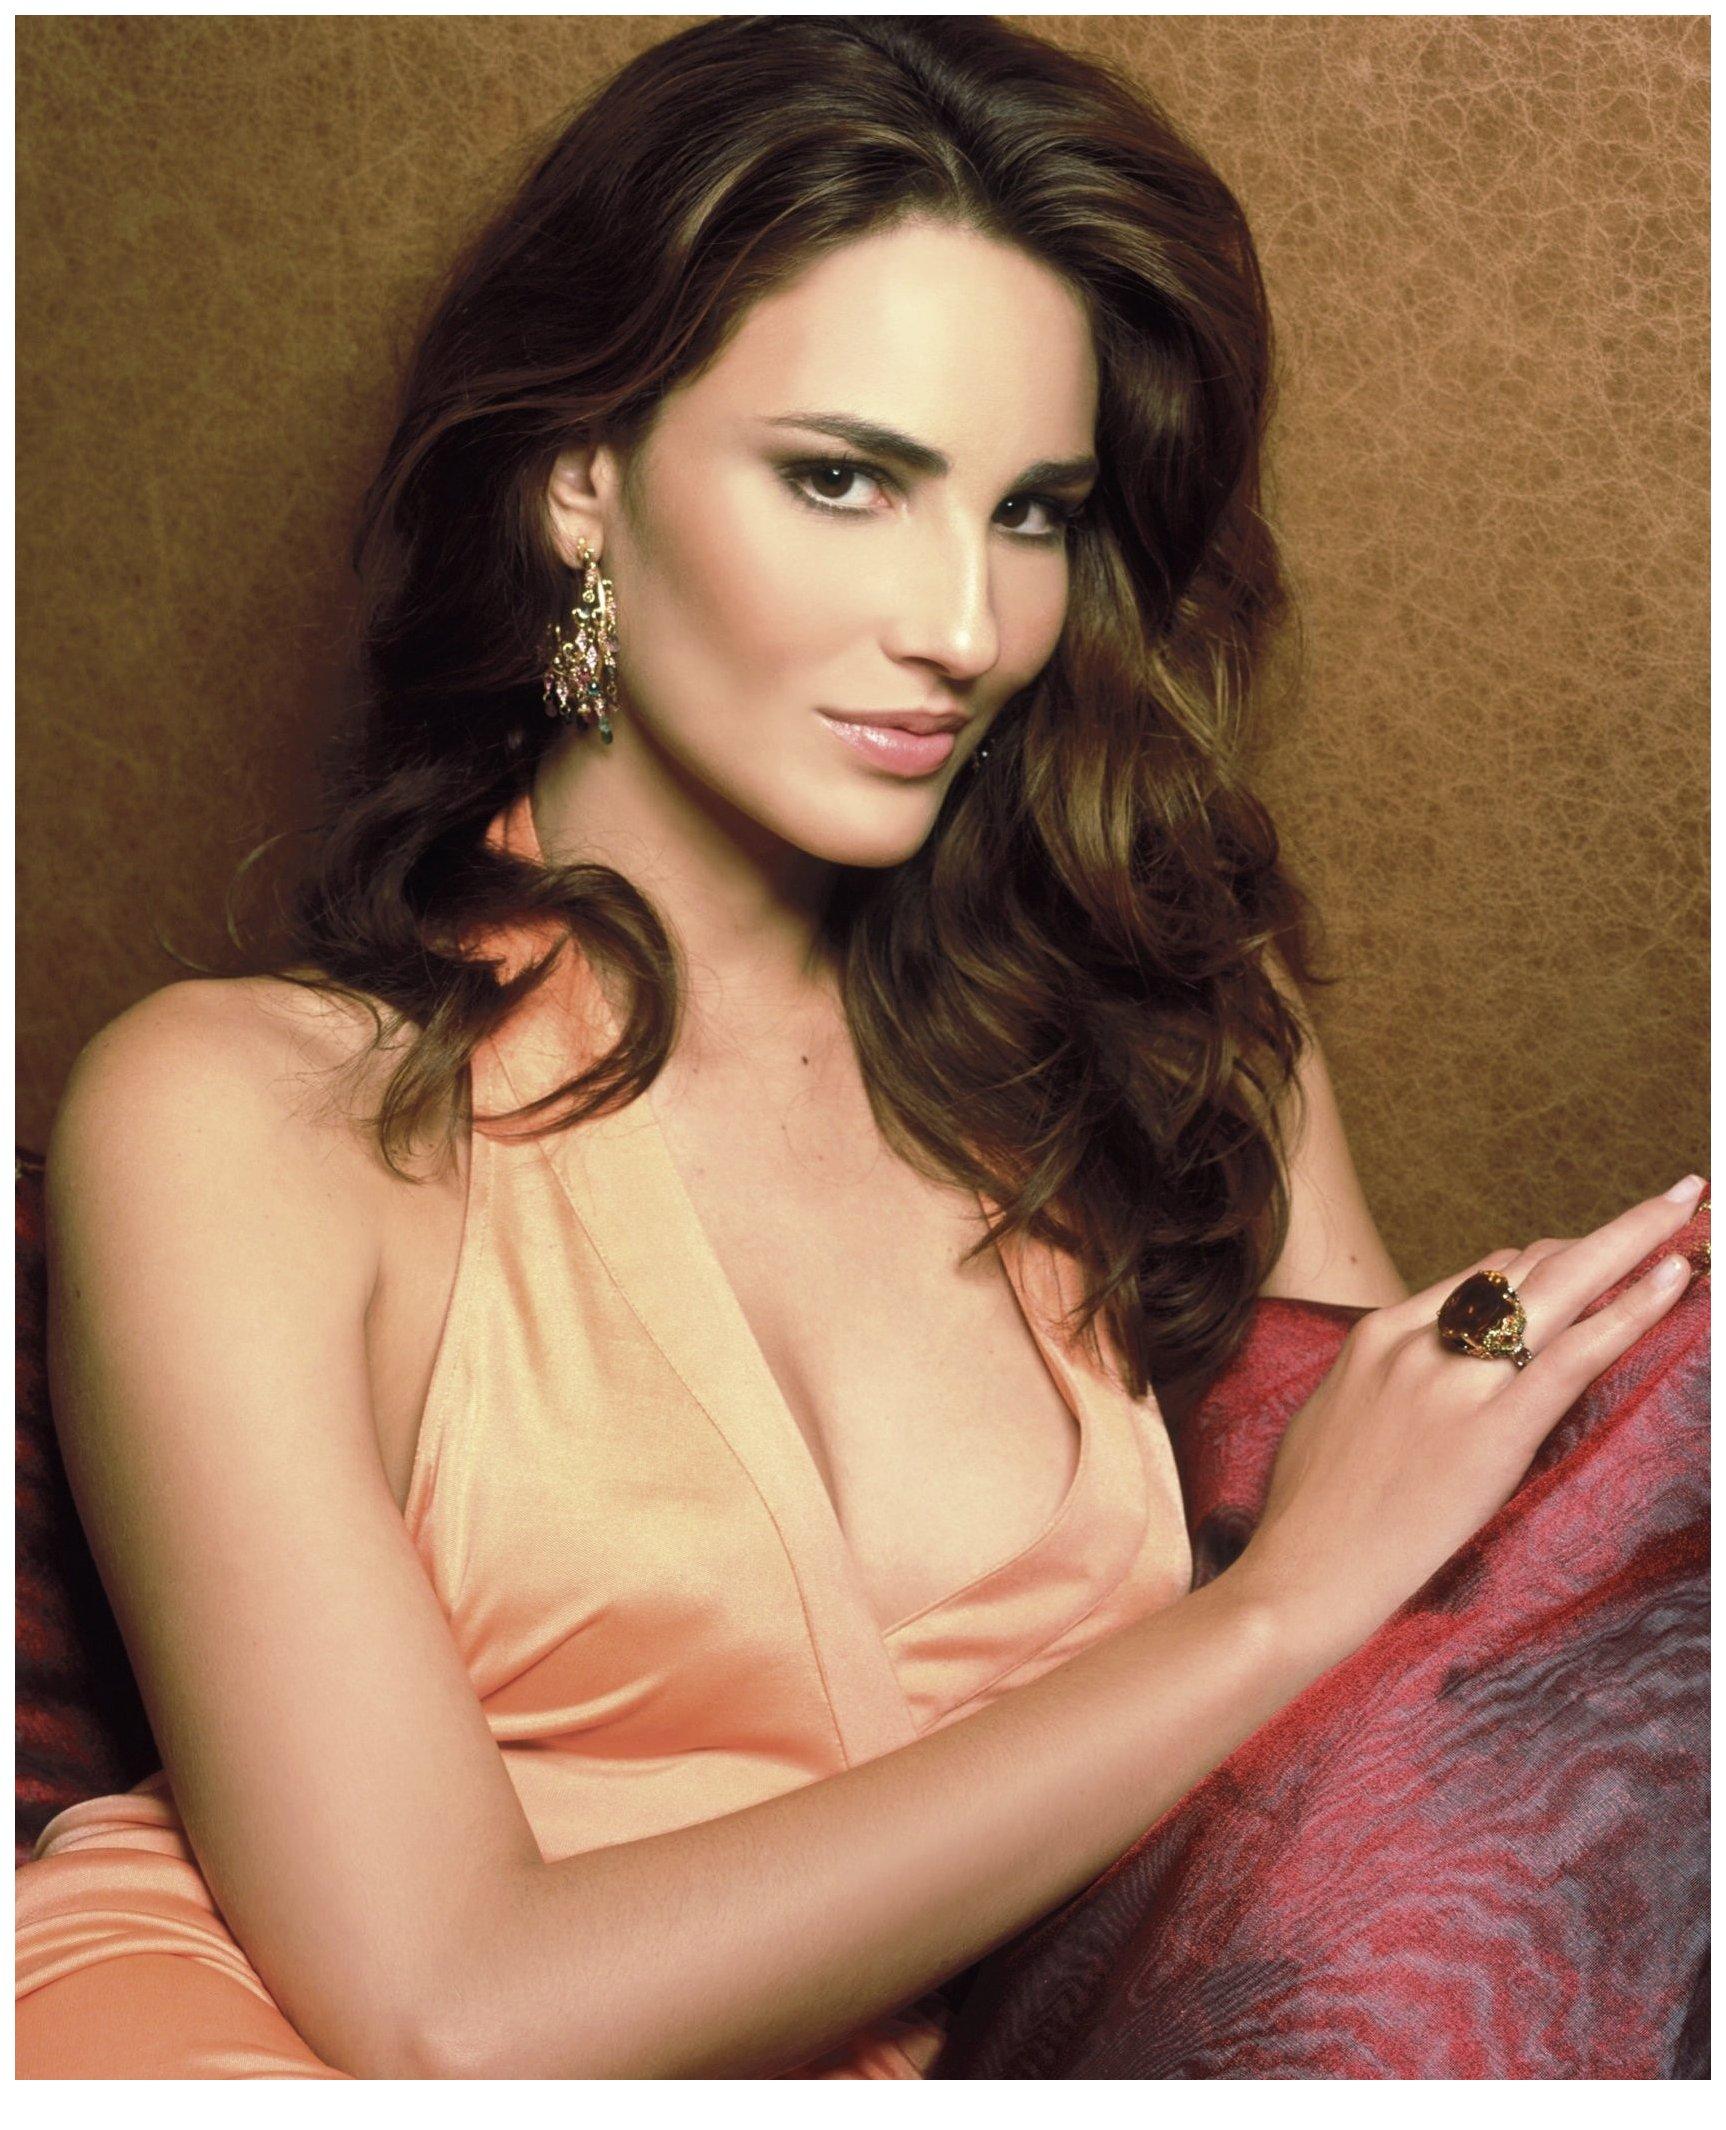 Photos of Model Fernanda Tavares | POPSUGAR Fashion